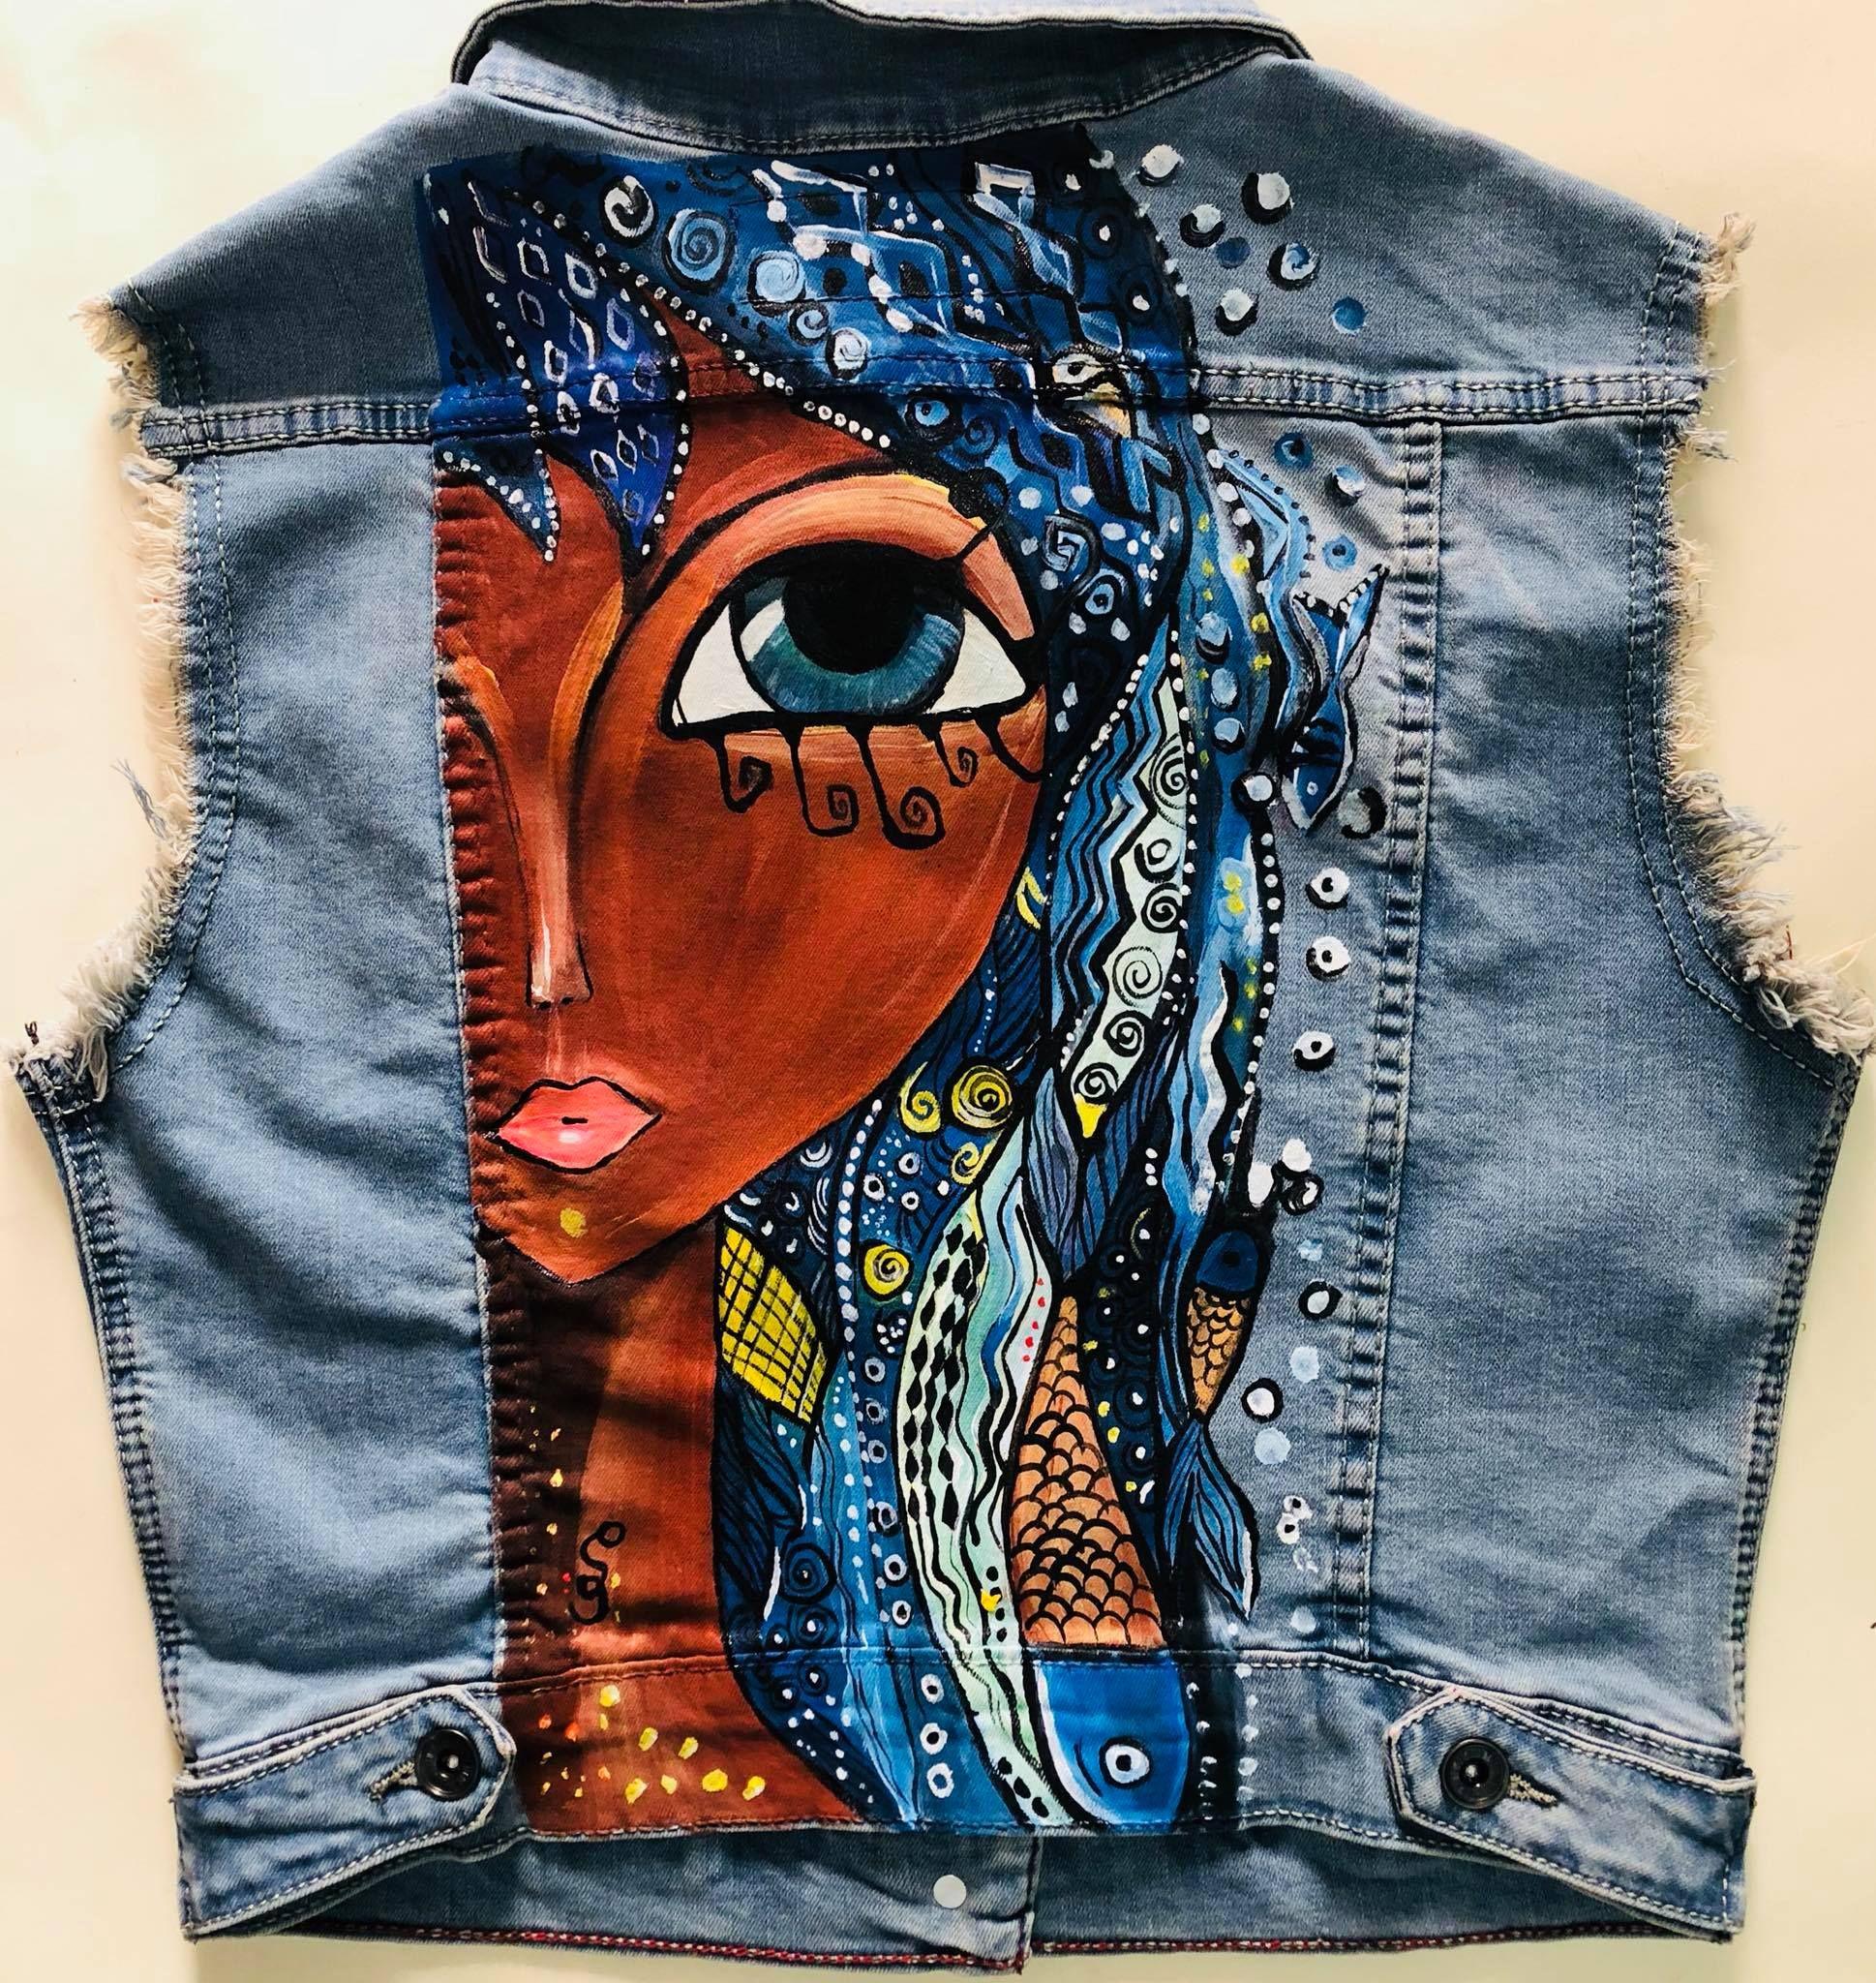 Hand Painted Jeans Vest Mai Kandeel Designs Hand Painted Denim Jacket Painted Clothes Painted Clothes Diy [ 2048 x 1938 Pixel ]